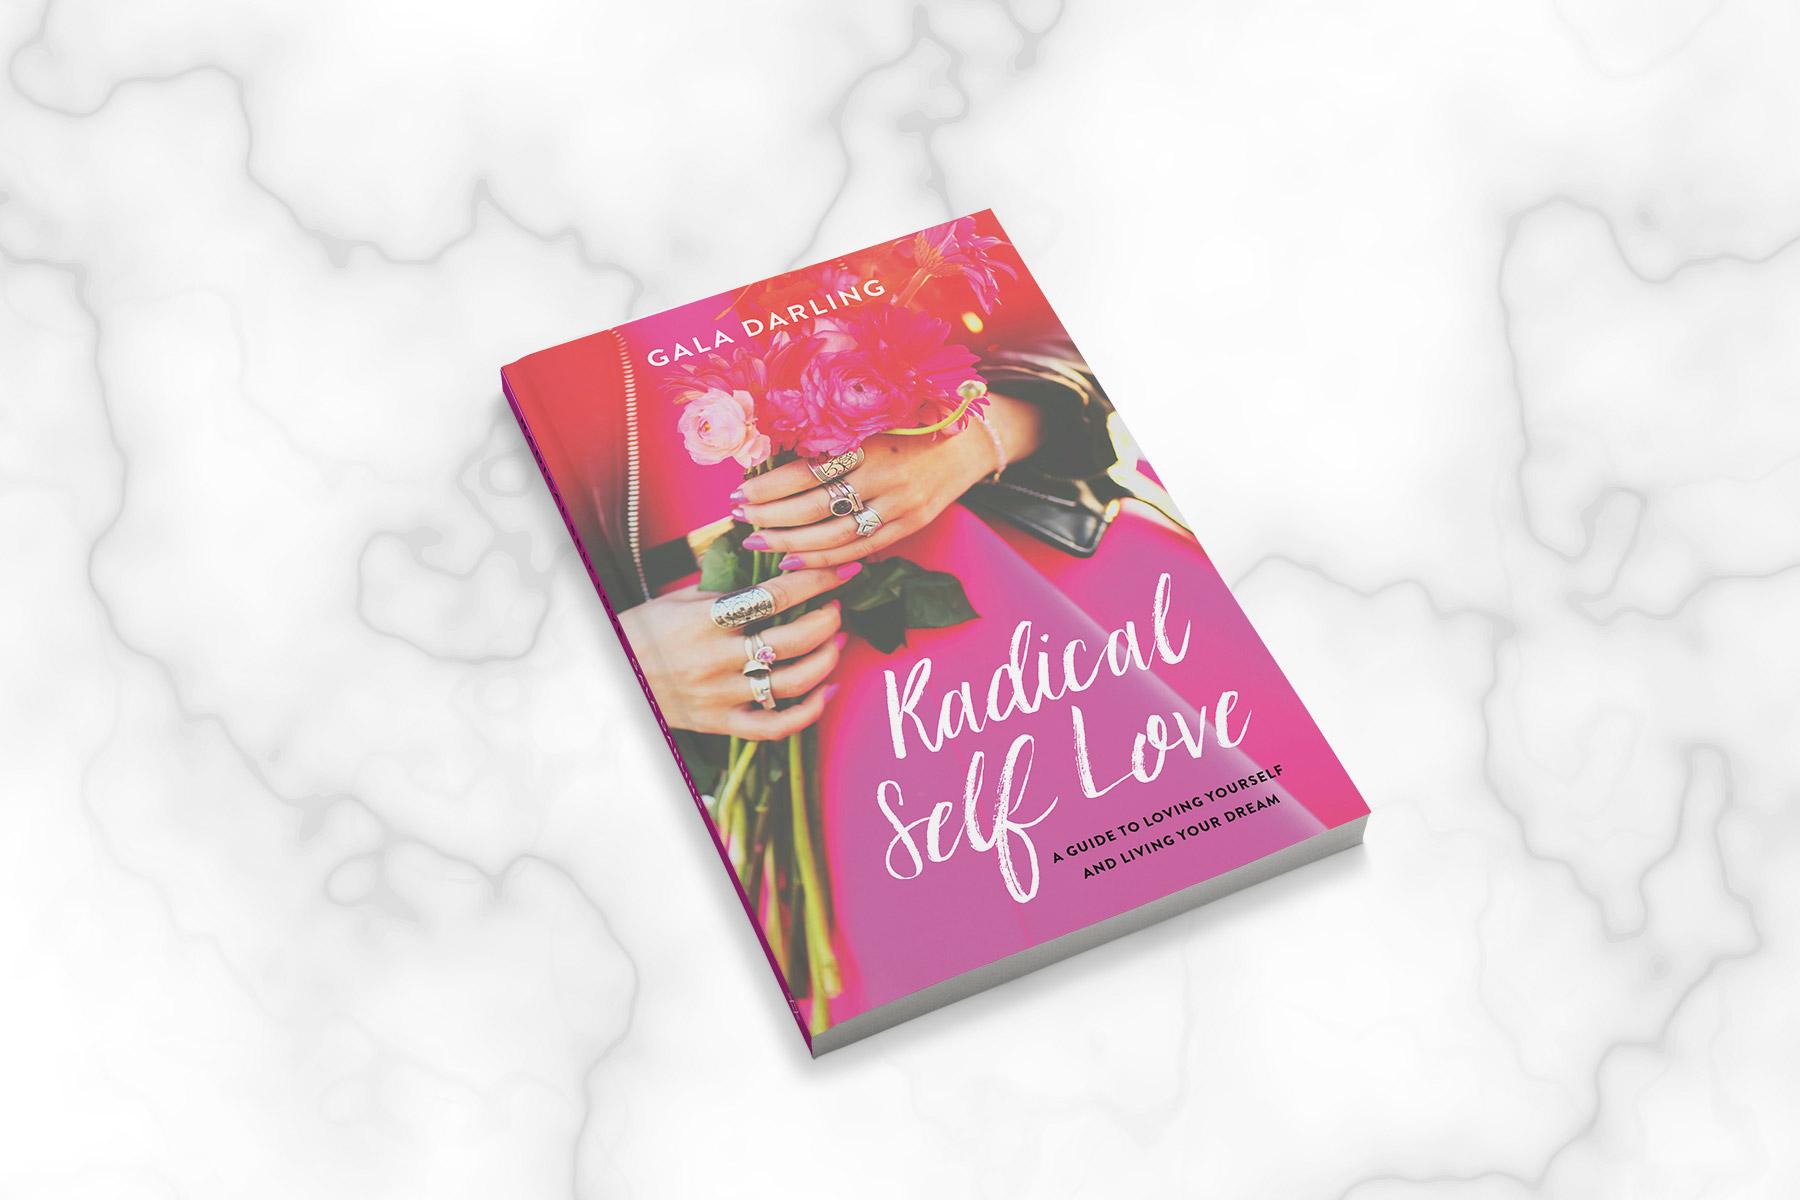 Branch | Radical Self Love Book by Gala Darling